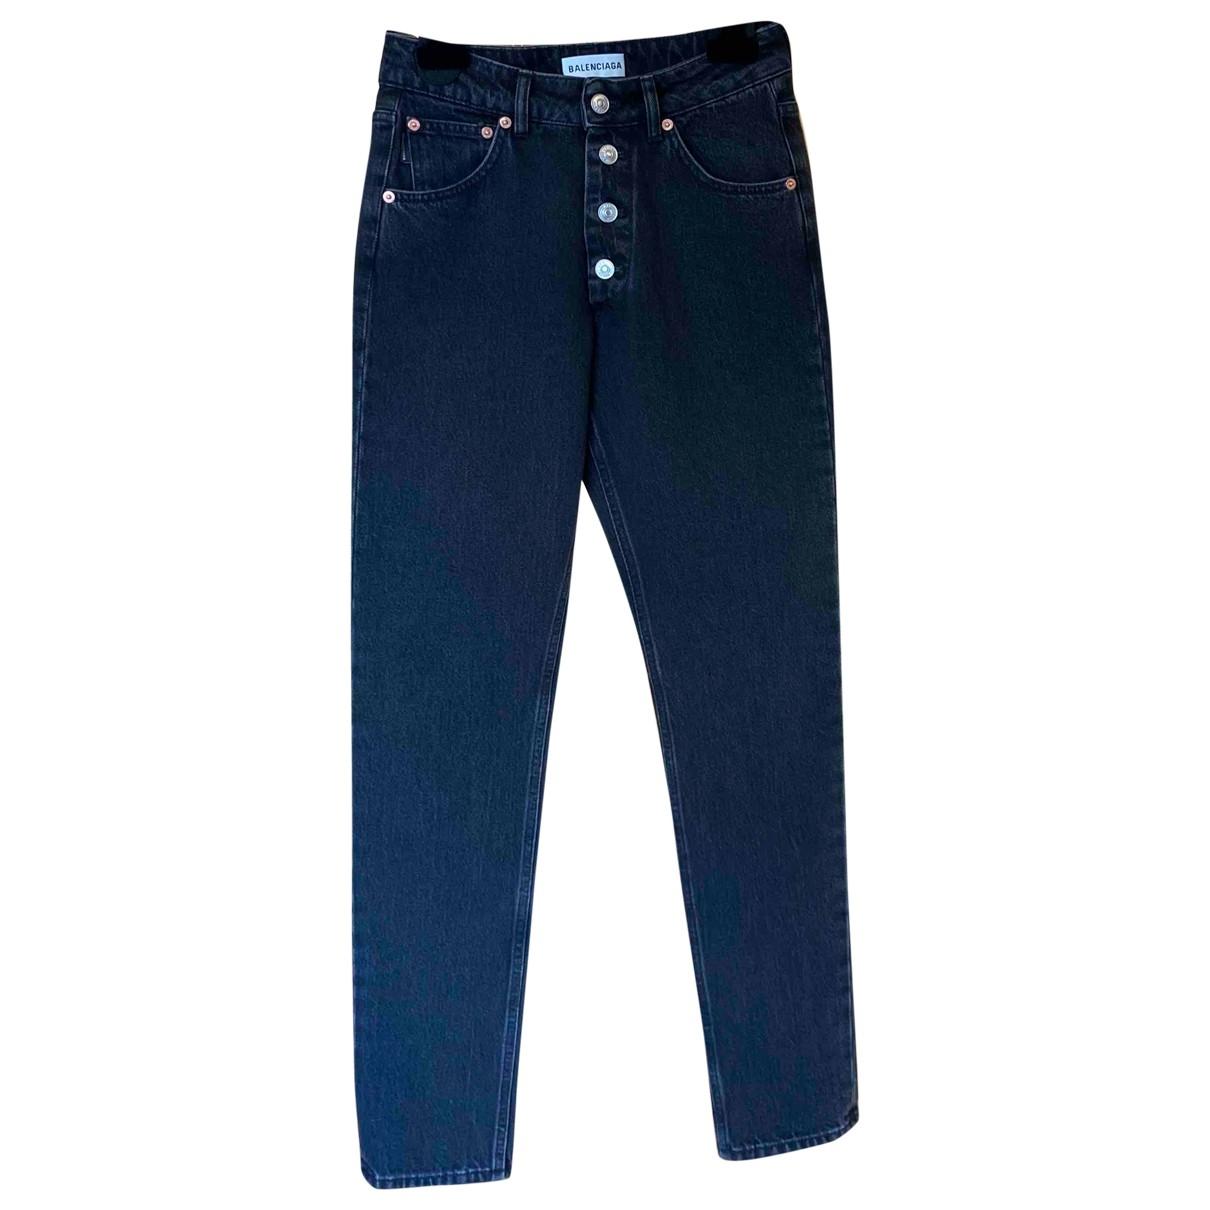 Balenciaga \N Grey Denim - Jeans Jeans for Women 26 US